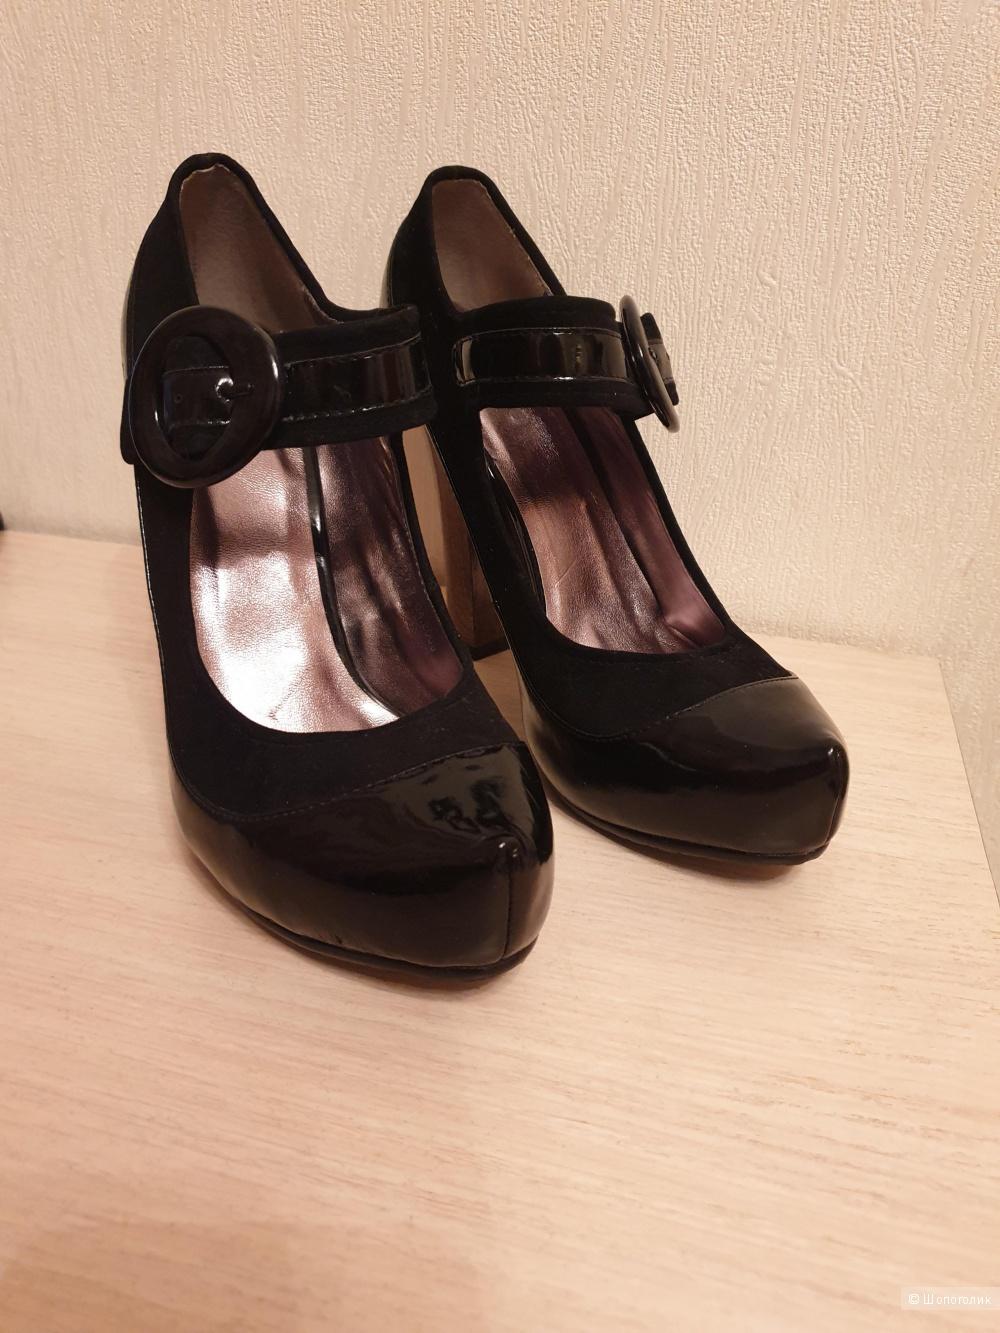 Туфли ф-ма Centro размер 37,5 размера